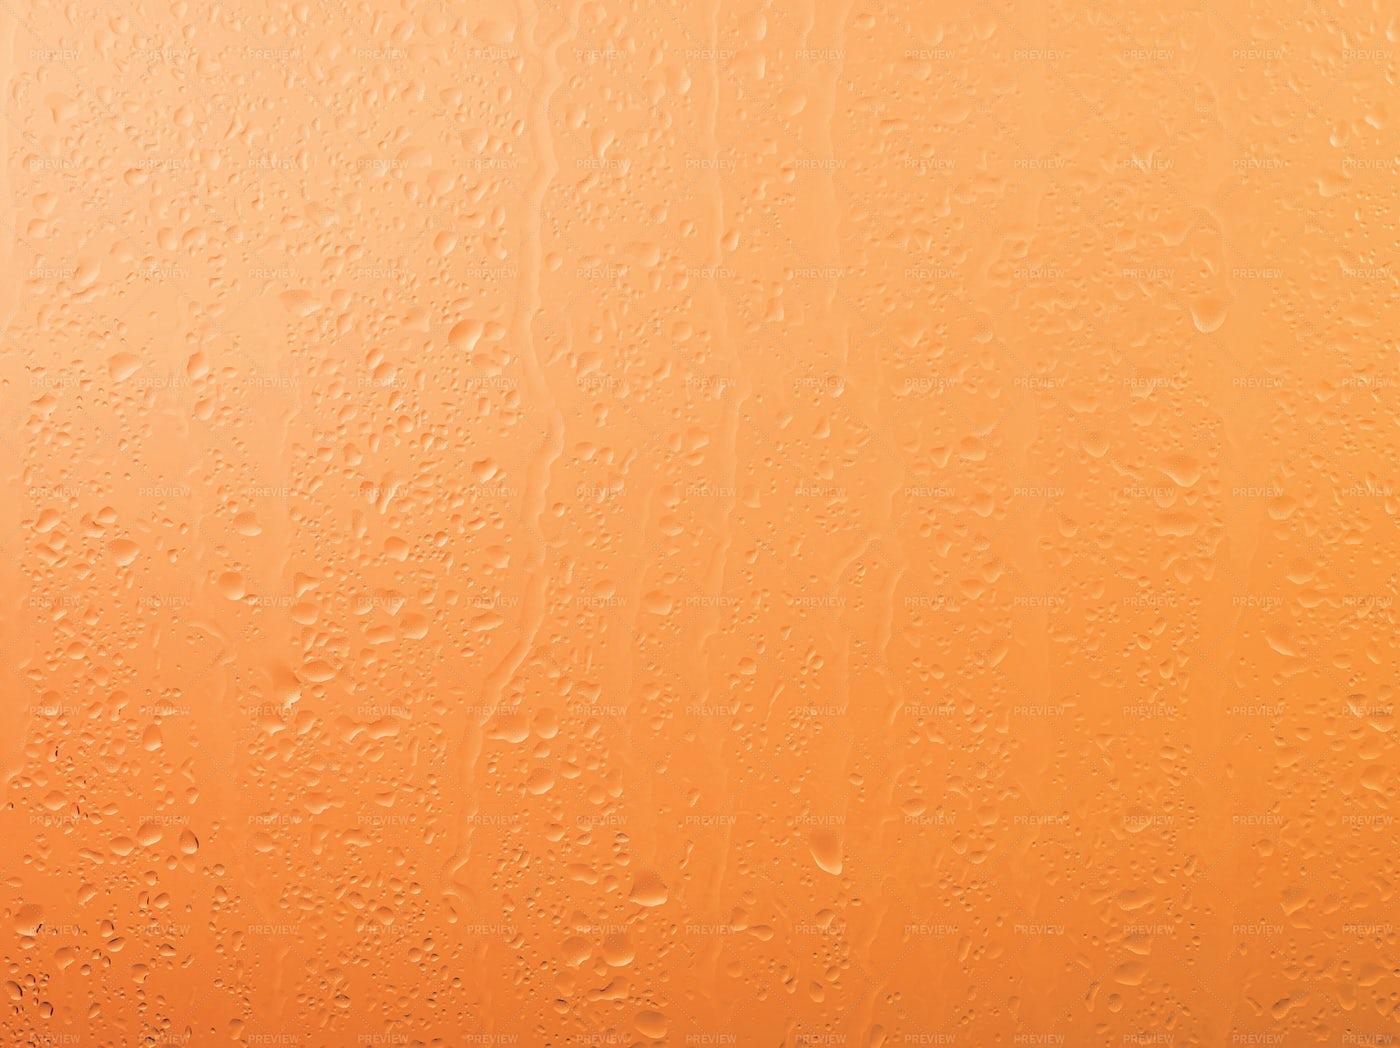 Raindrops On Orange Glass: Stock Photos